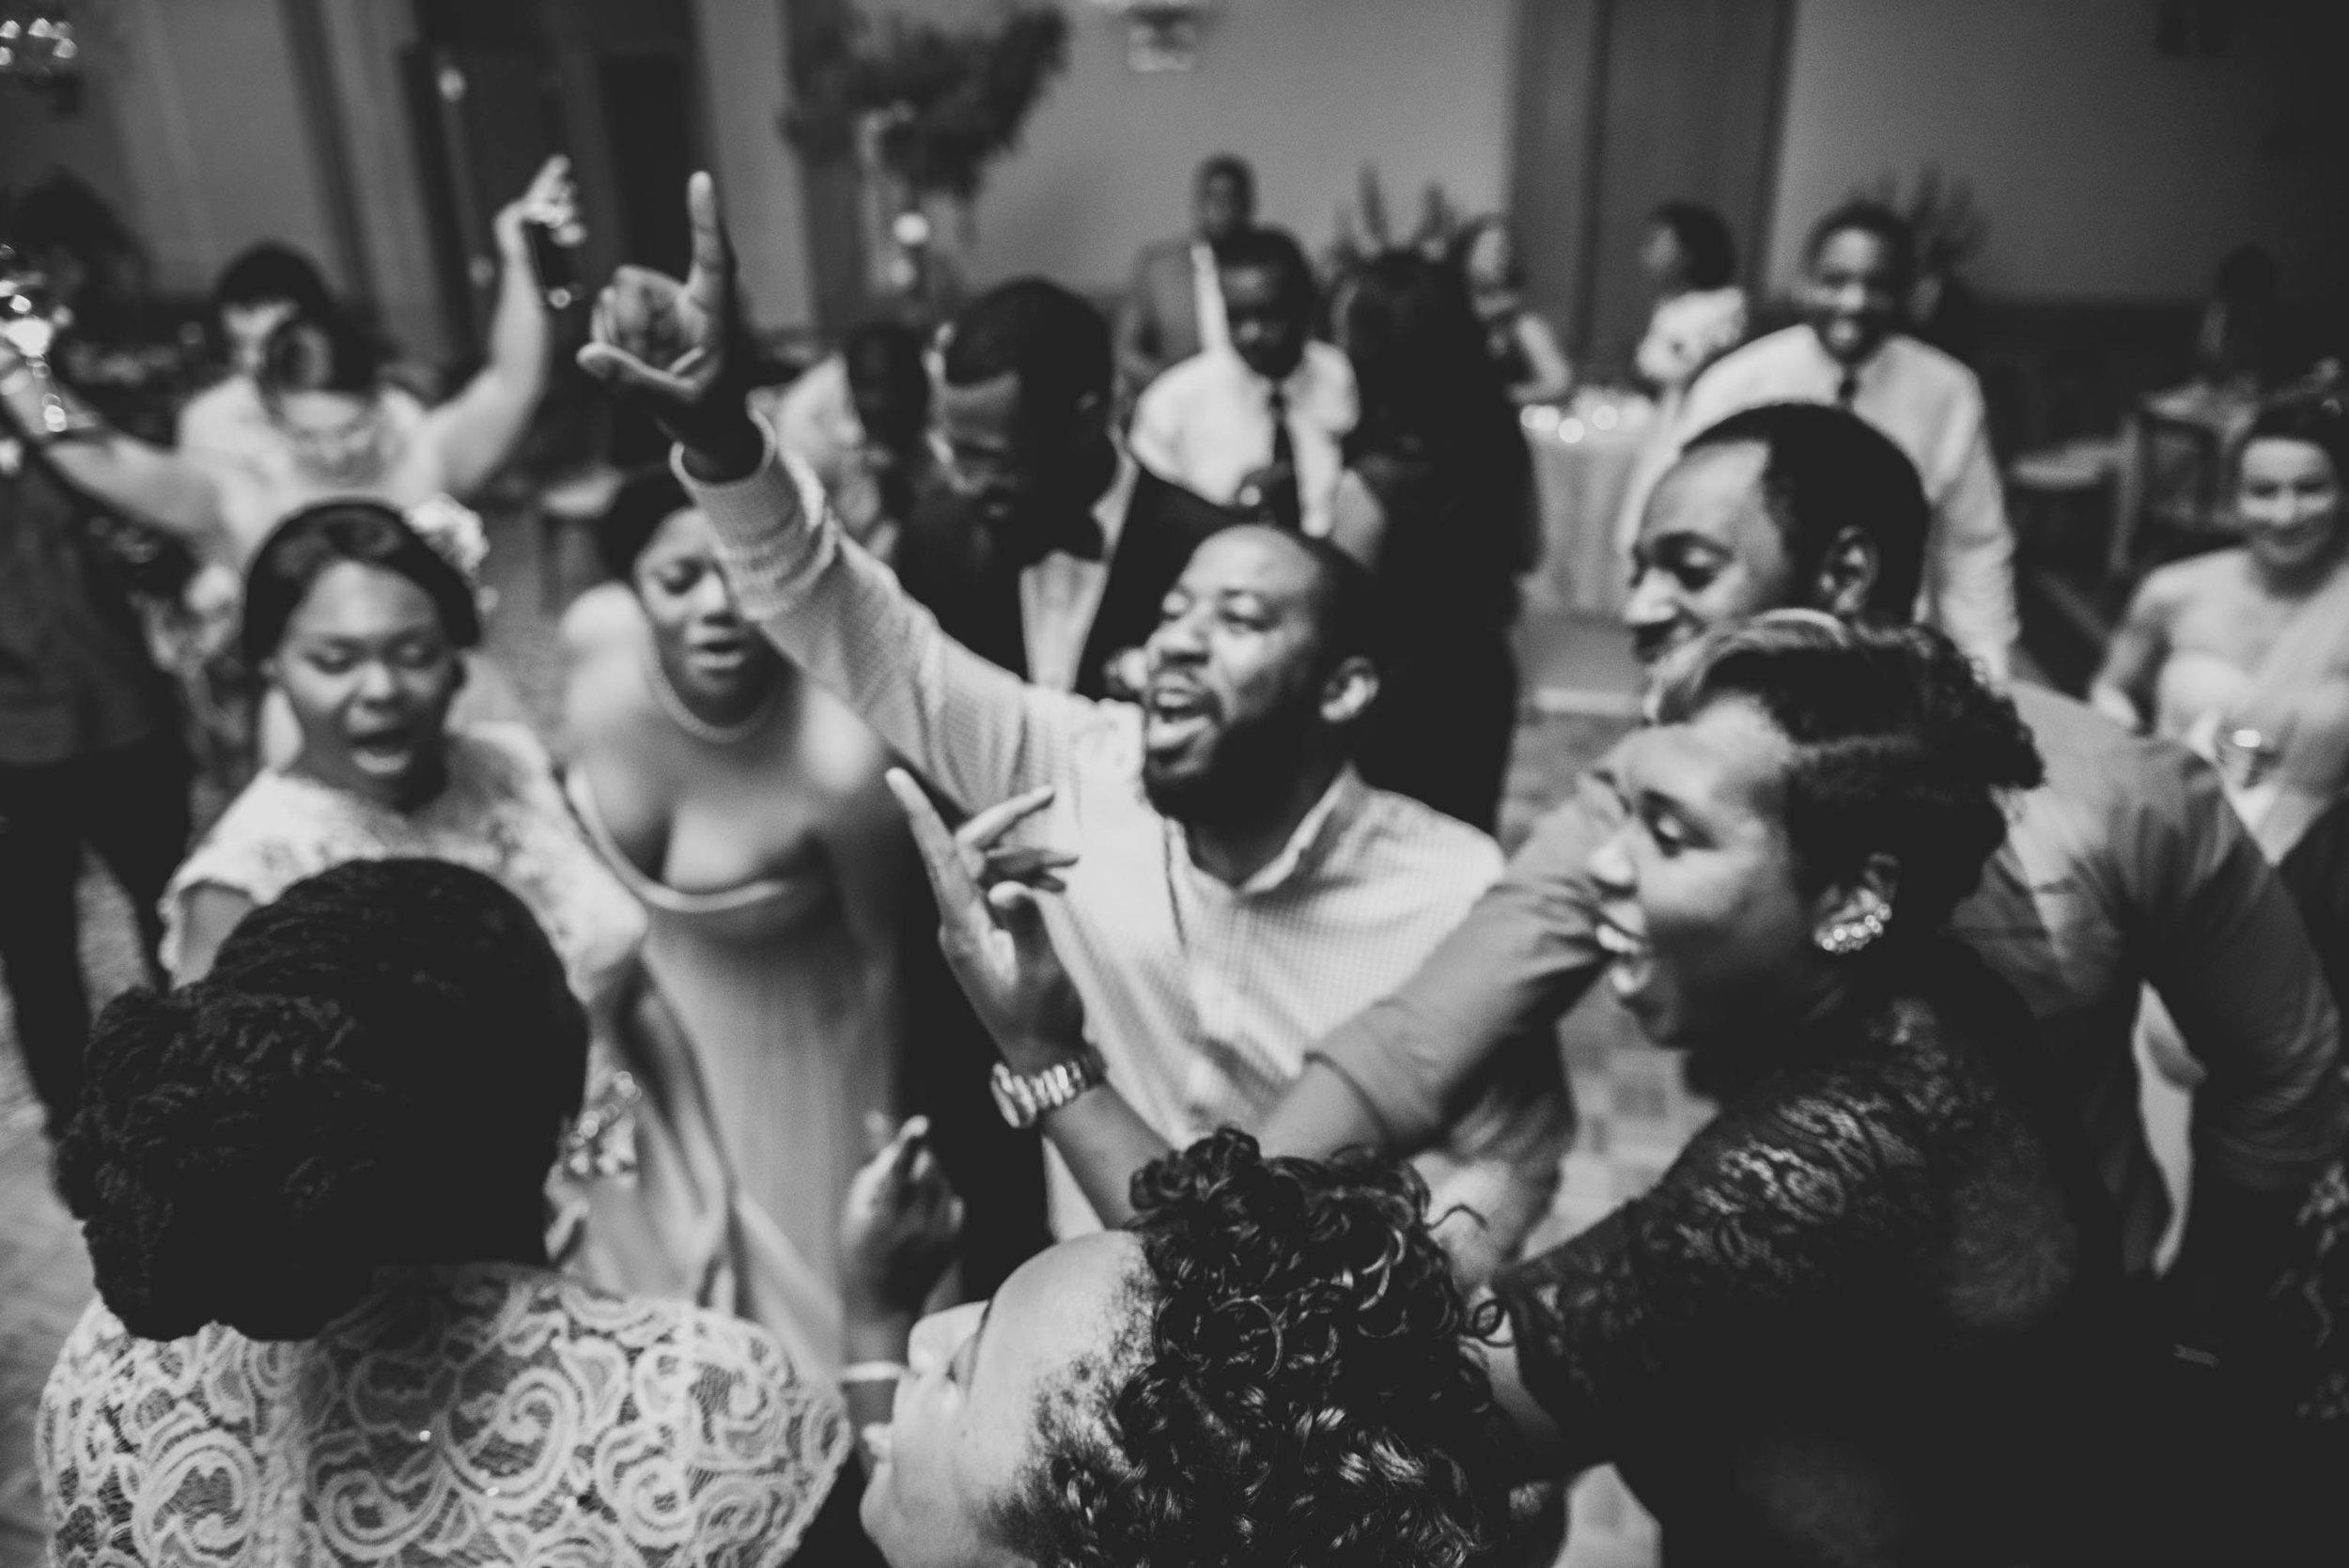 Wedding guests dancing at this Raleigh, NC wedding